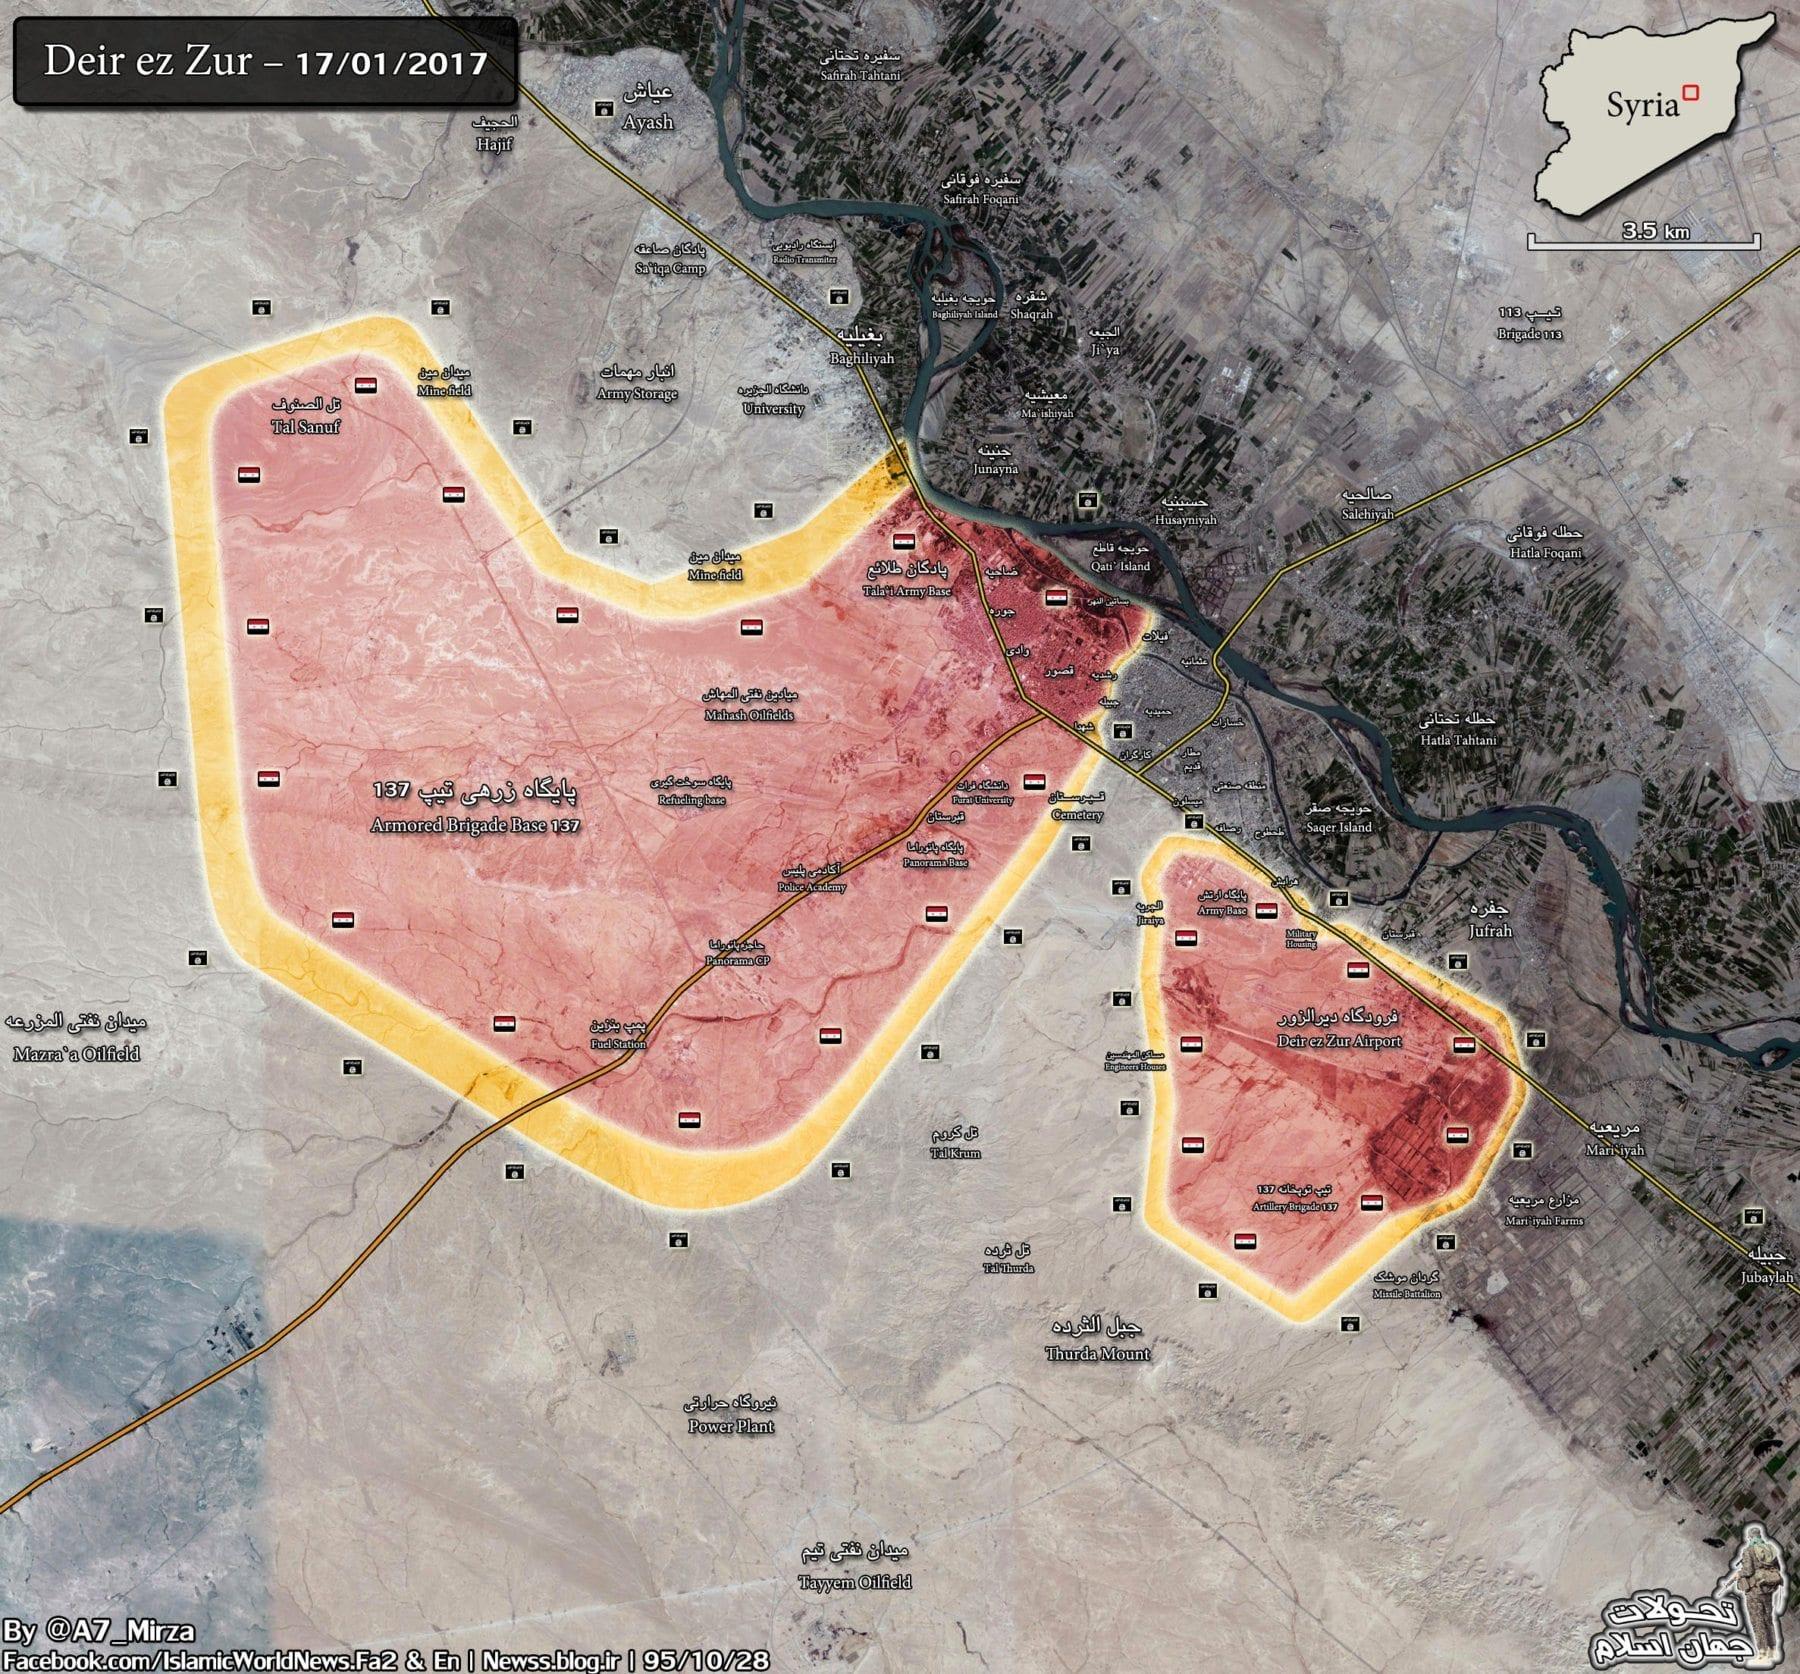 Image map Deir Ezzor, January 2017